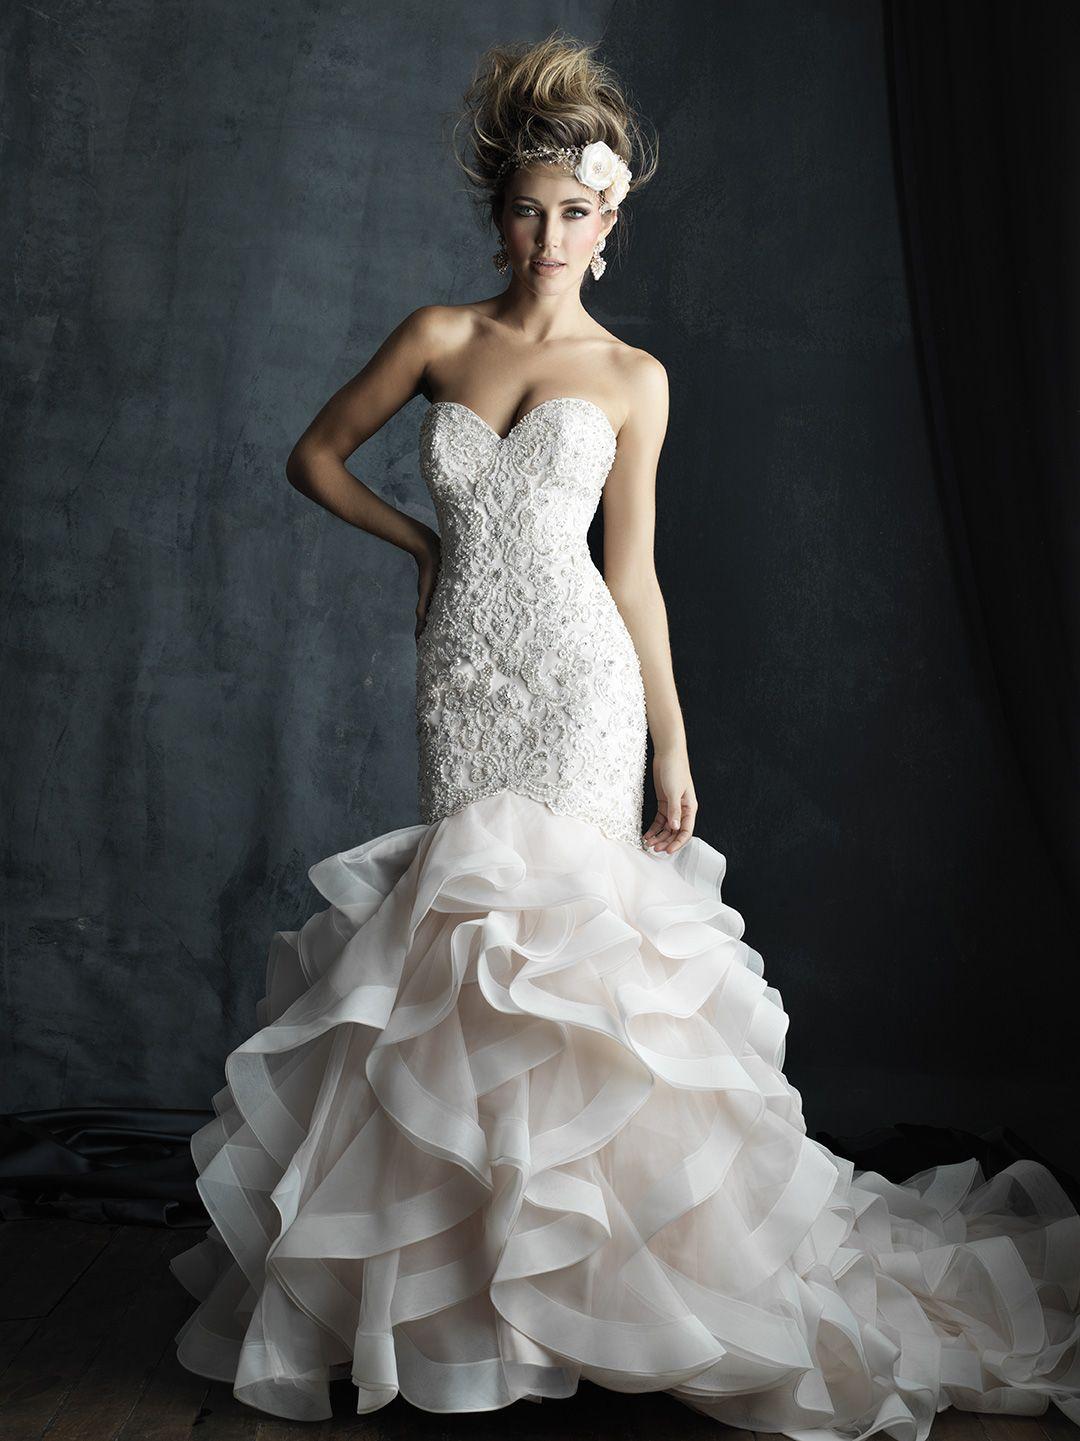 Curve-hugging Allure Bridals gown with Swarvoski beadwork: http ...